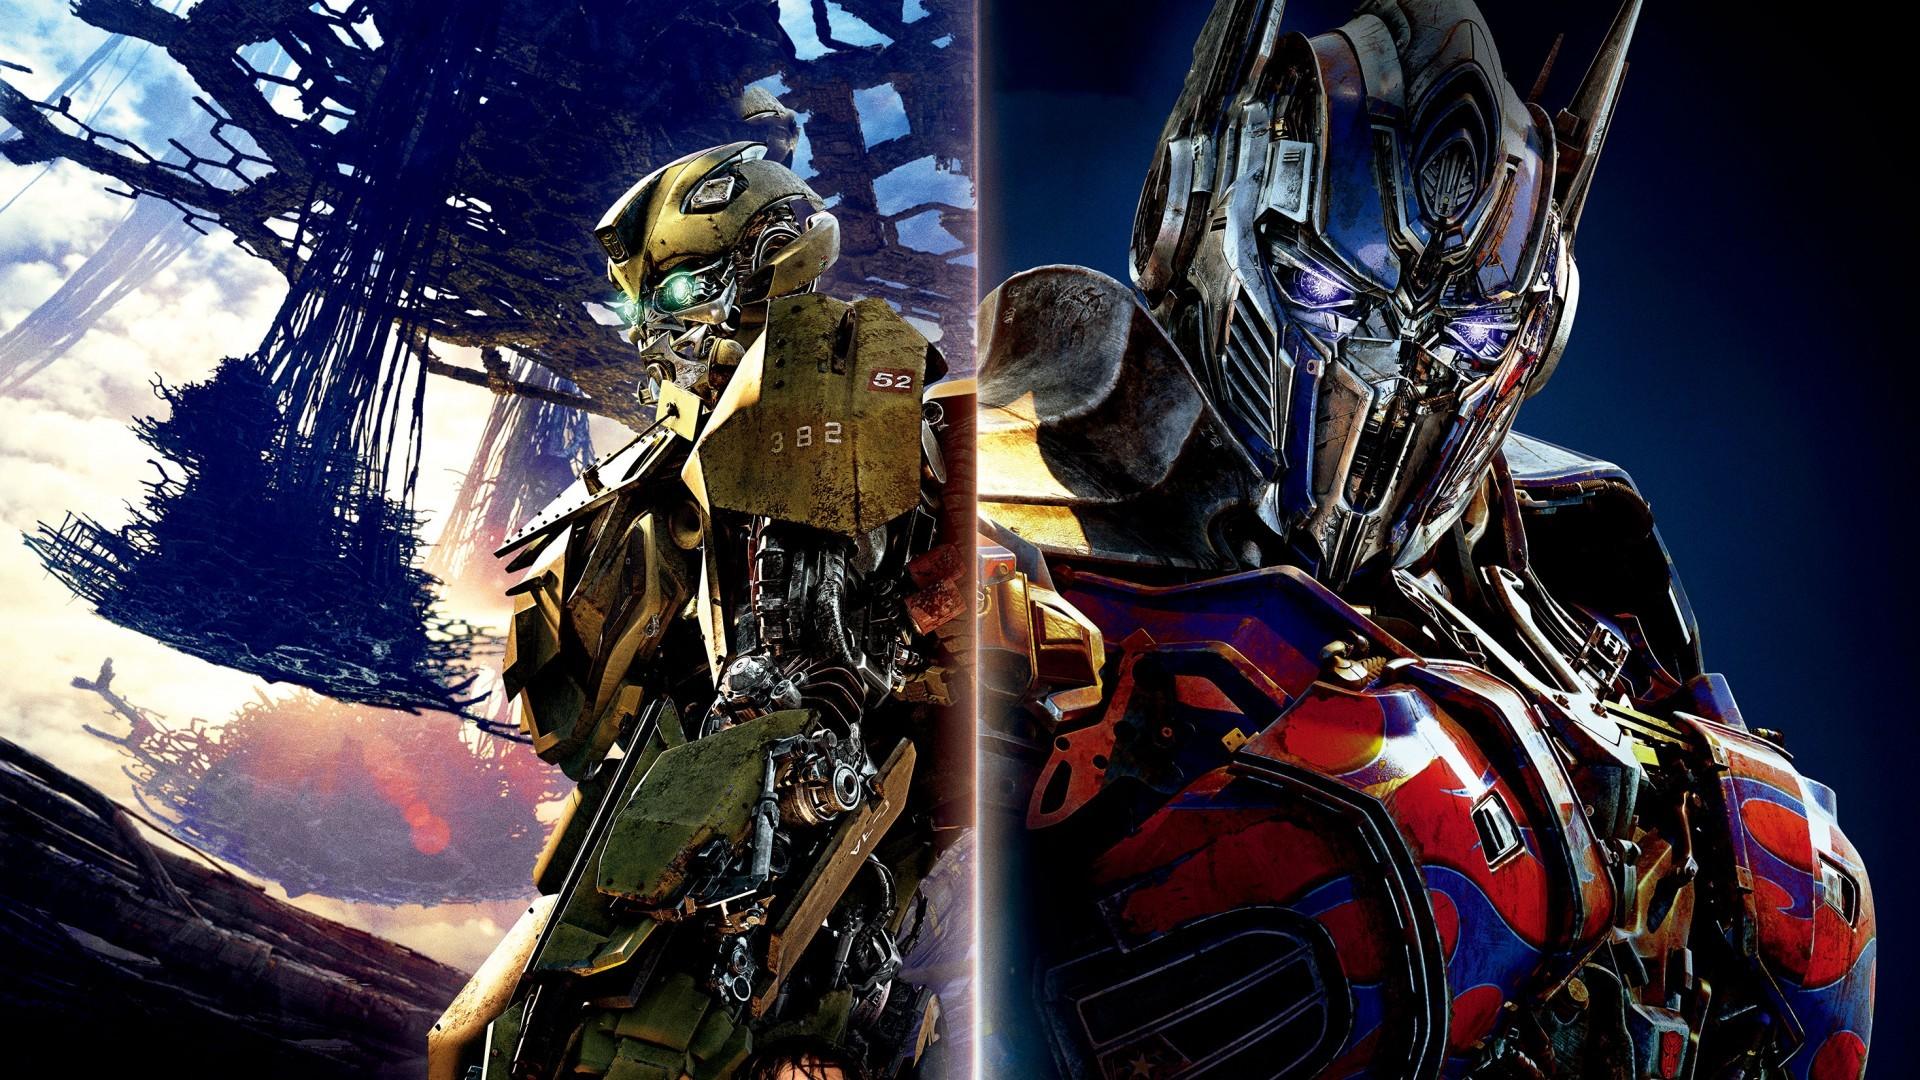 … x 1080 2560 x 1440 Original. Description: Download Bumblebee vs Optimus  Prime Movies wallpaper …